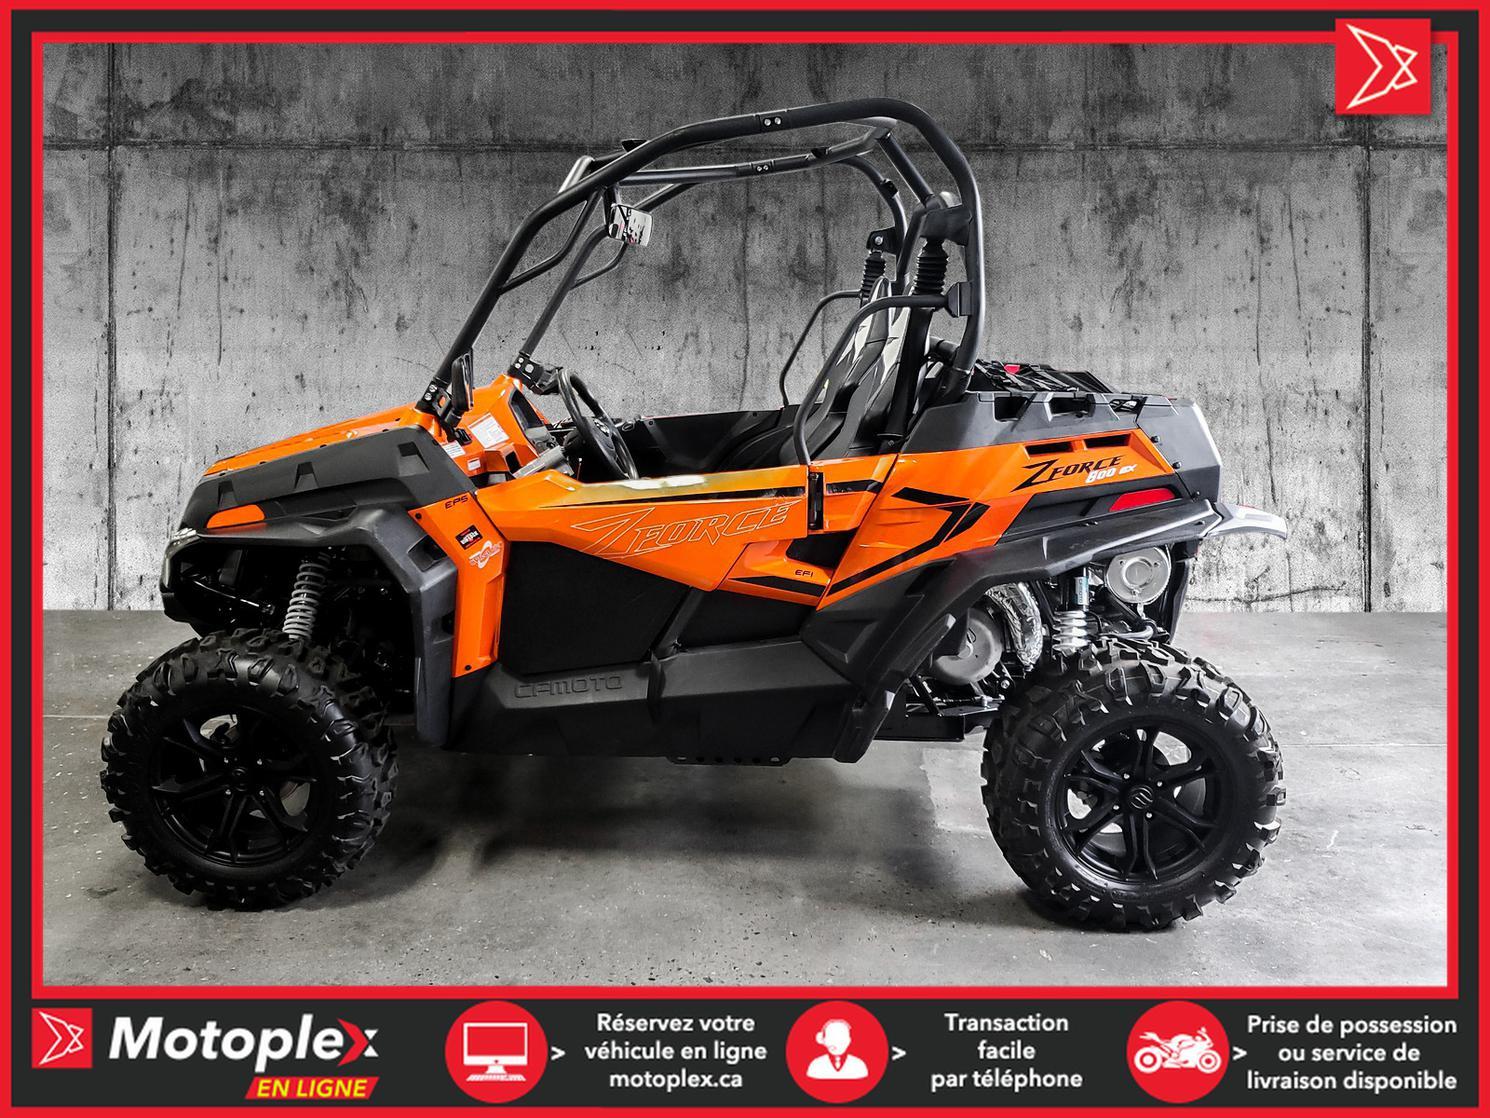 2021 CFMOTO Z-FORCE 800 EX EPS LX  ( DÉMO ) - 54$/semaine